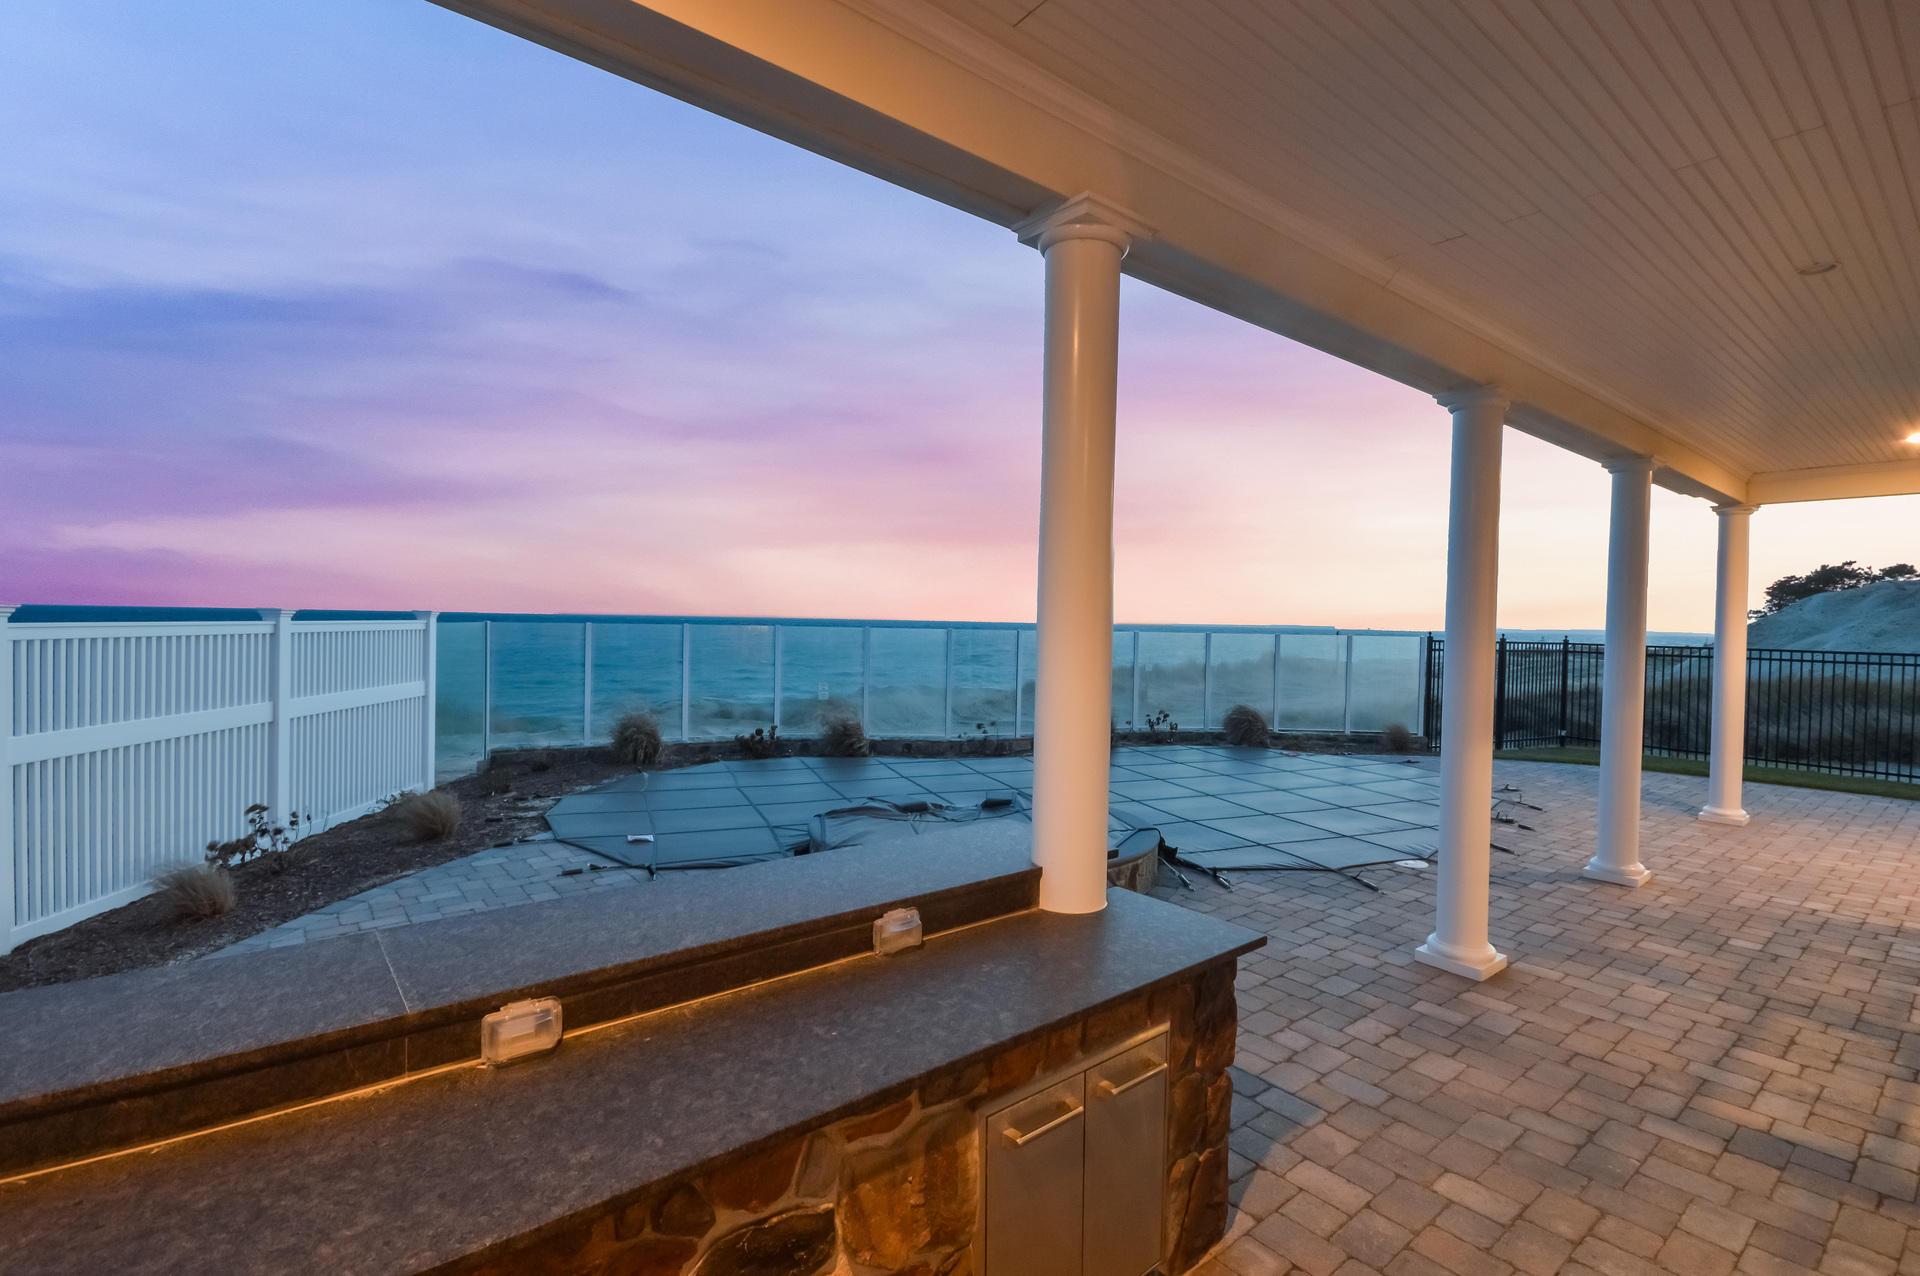 50 Coastline Drive, New Seabury, Massachusetts, 02649, 5 Bedrooms Bedrooms, ,4 BathroomsBathrooms,Residential,For Sale,50 Coastline Drive,22002697